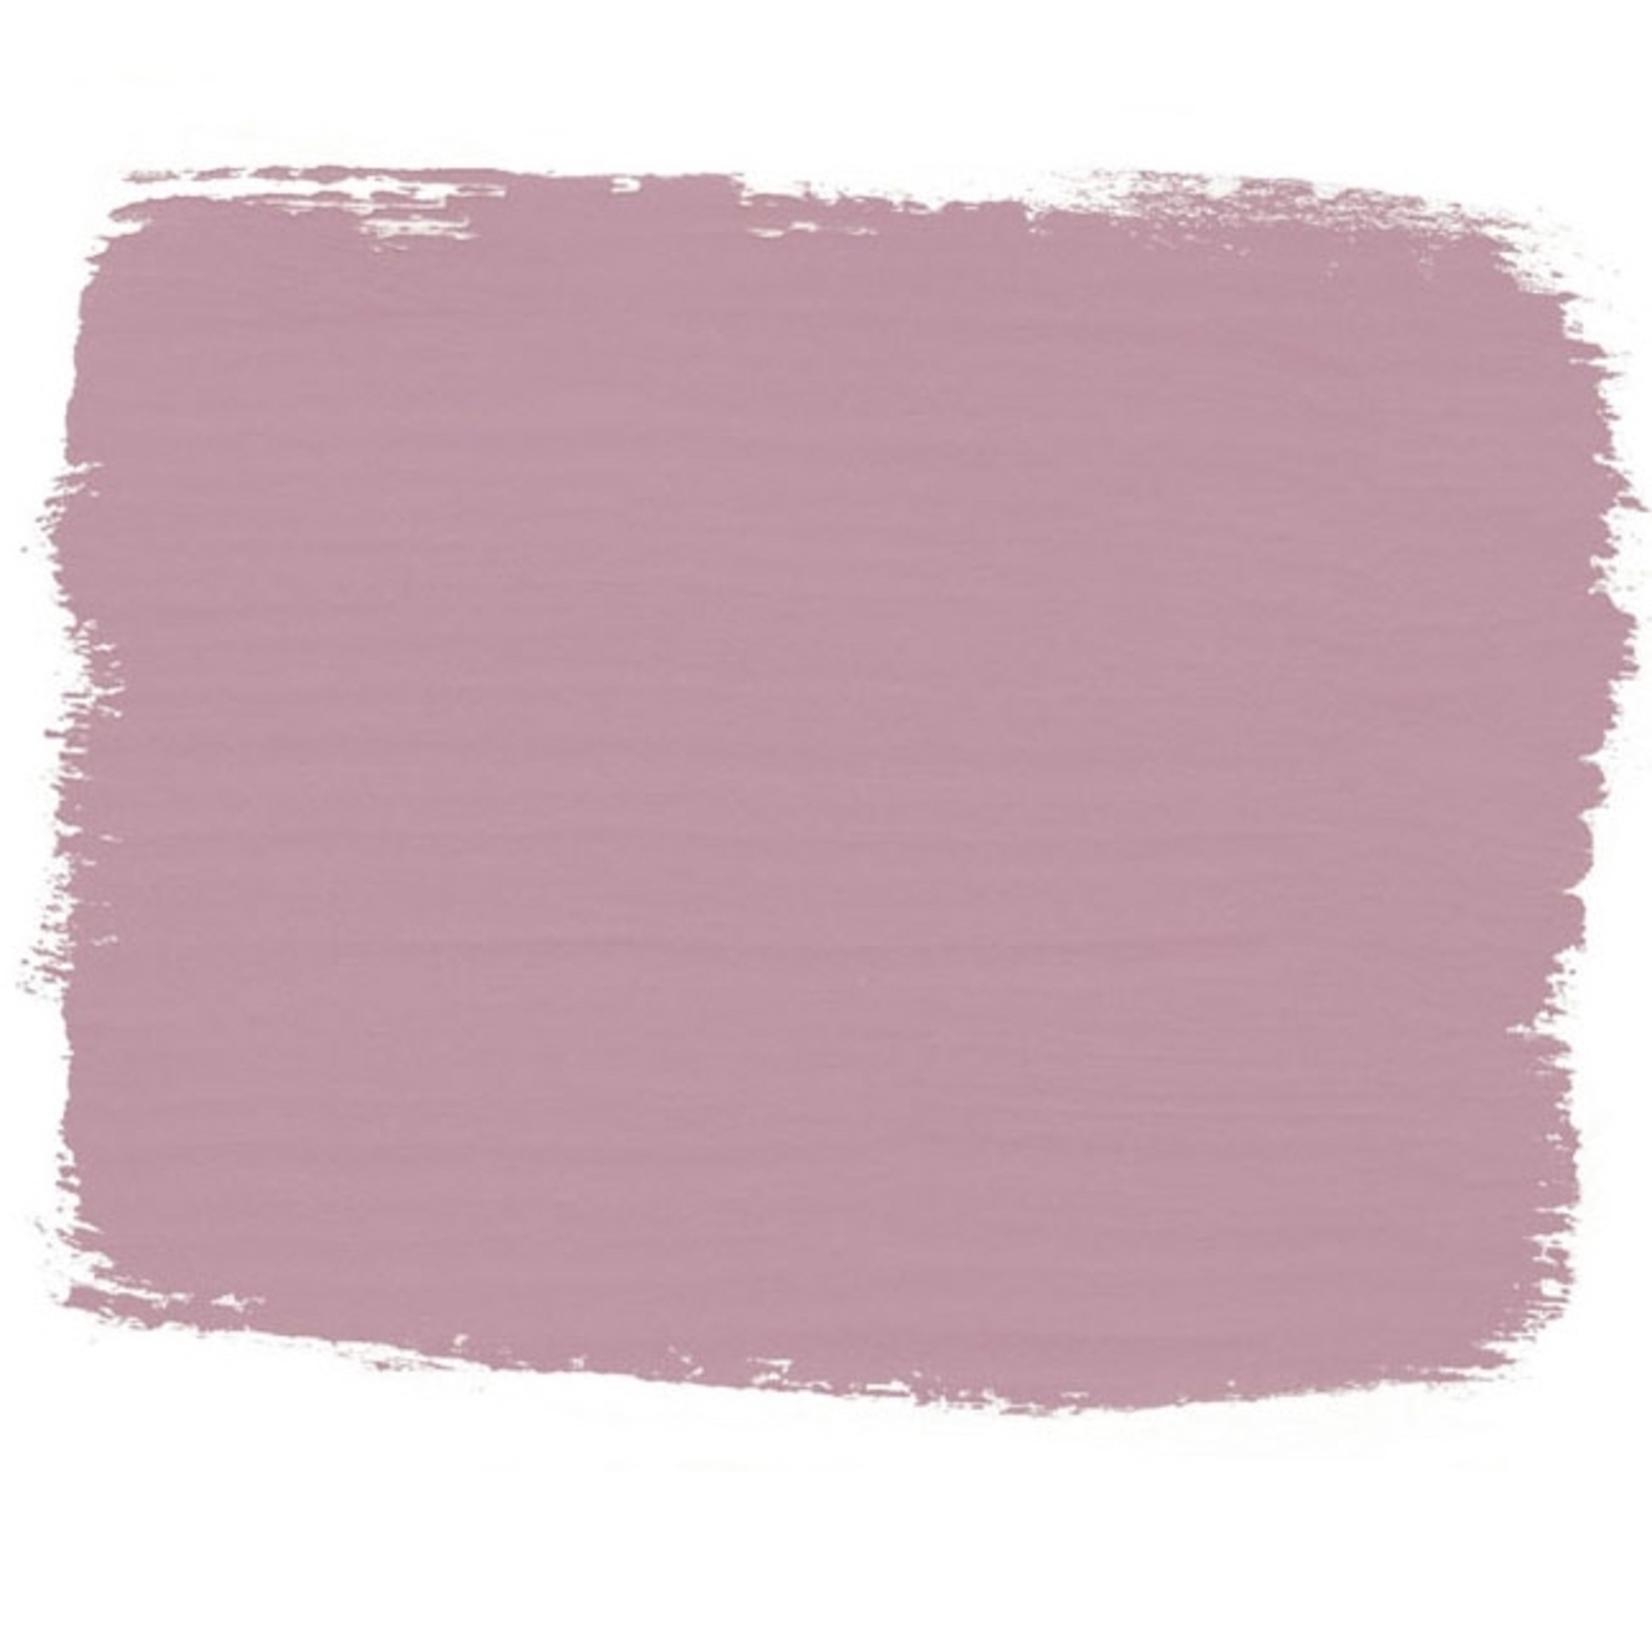 Annie Sloan Annie Sloan Henrietta Chalk Paint DISCONTINUED